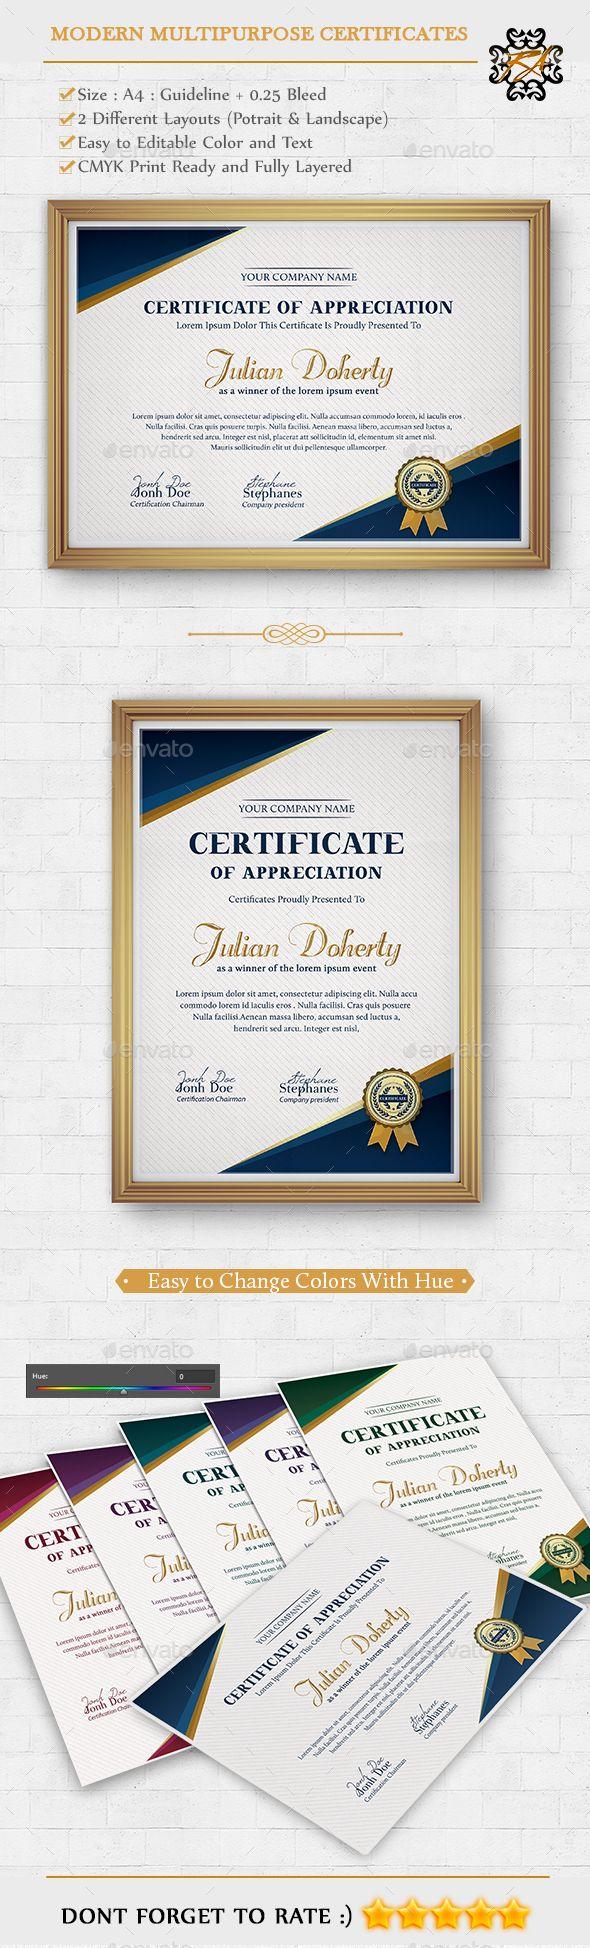 Modern Multipurpose Certificates Template PSD